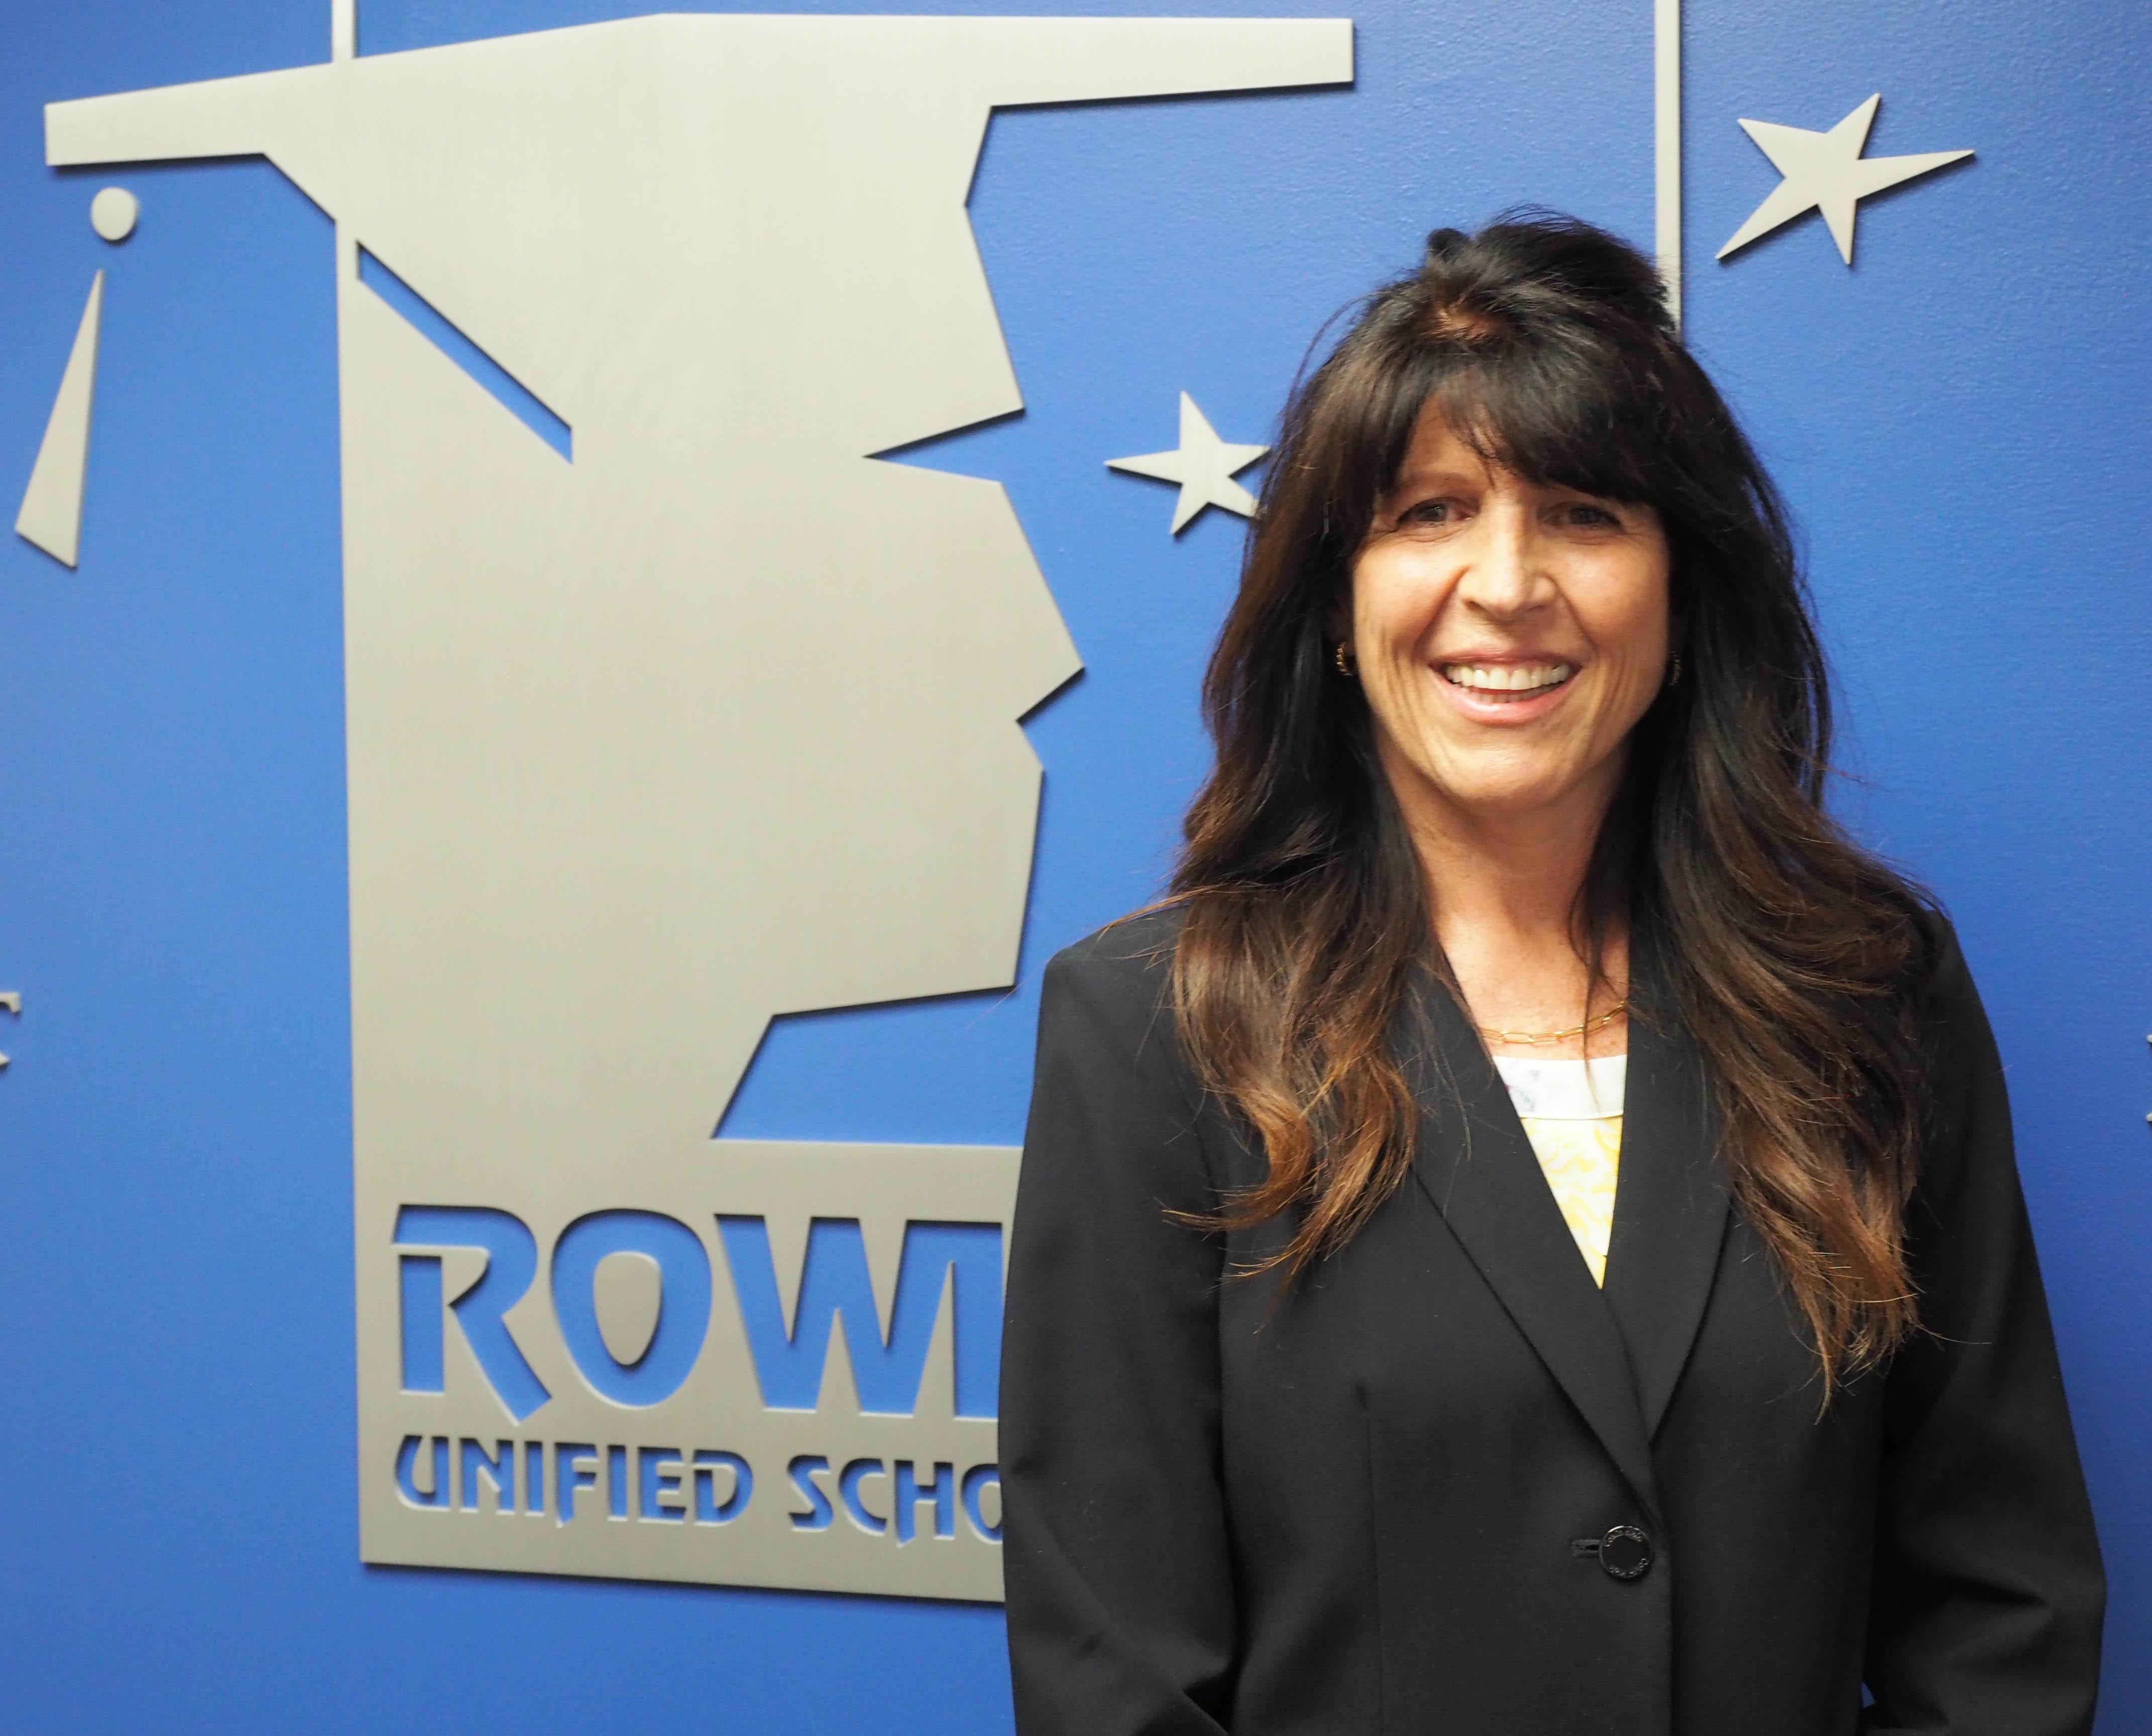 Rorimer Principal Heidi West